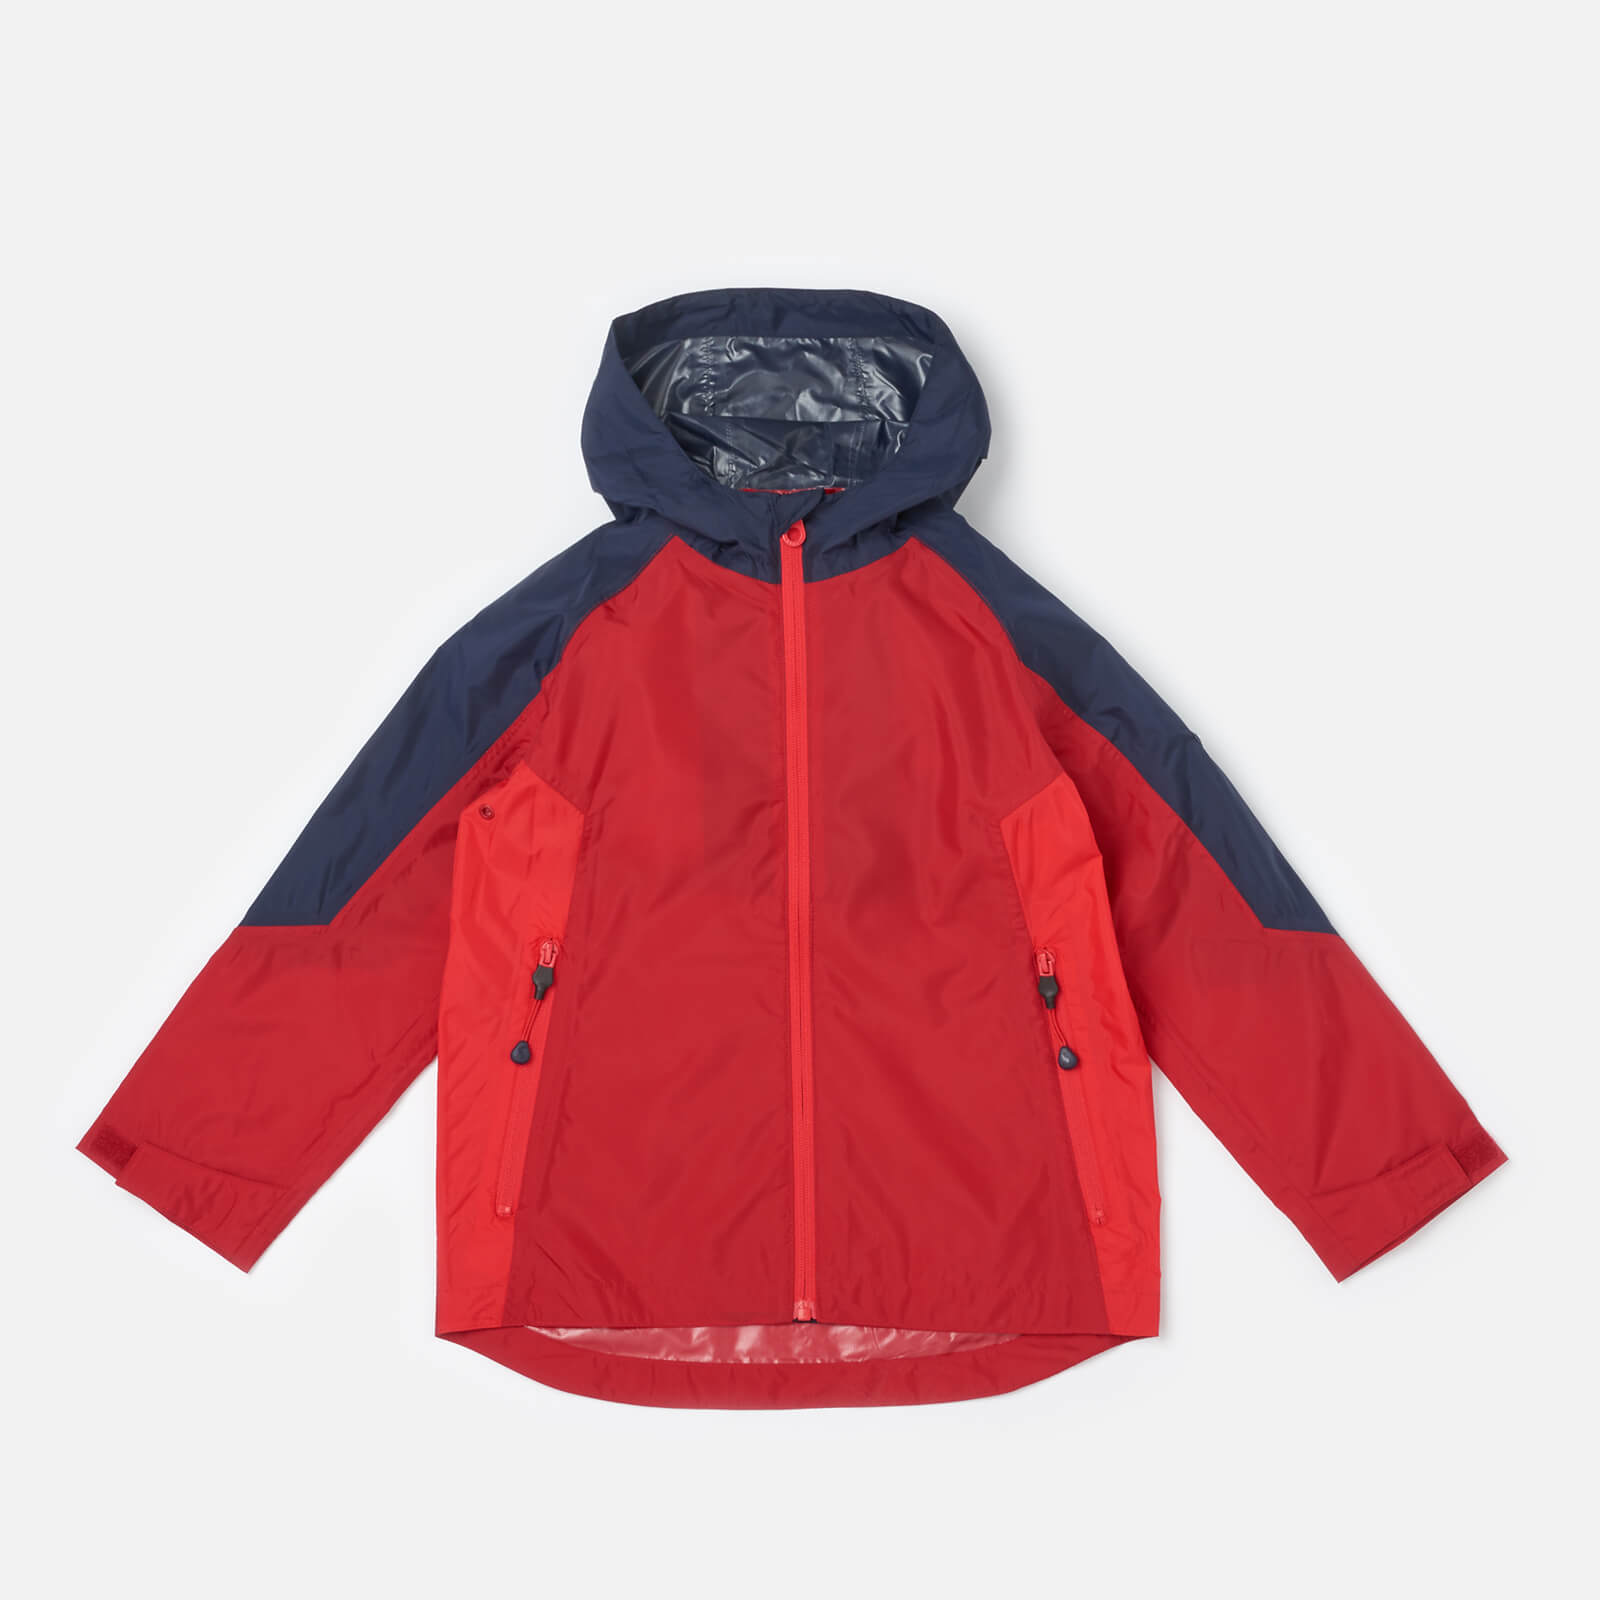 46053904ed92 Joules Boys  Dalton Waterproof Shell Jacket - Red Clothing